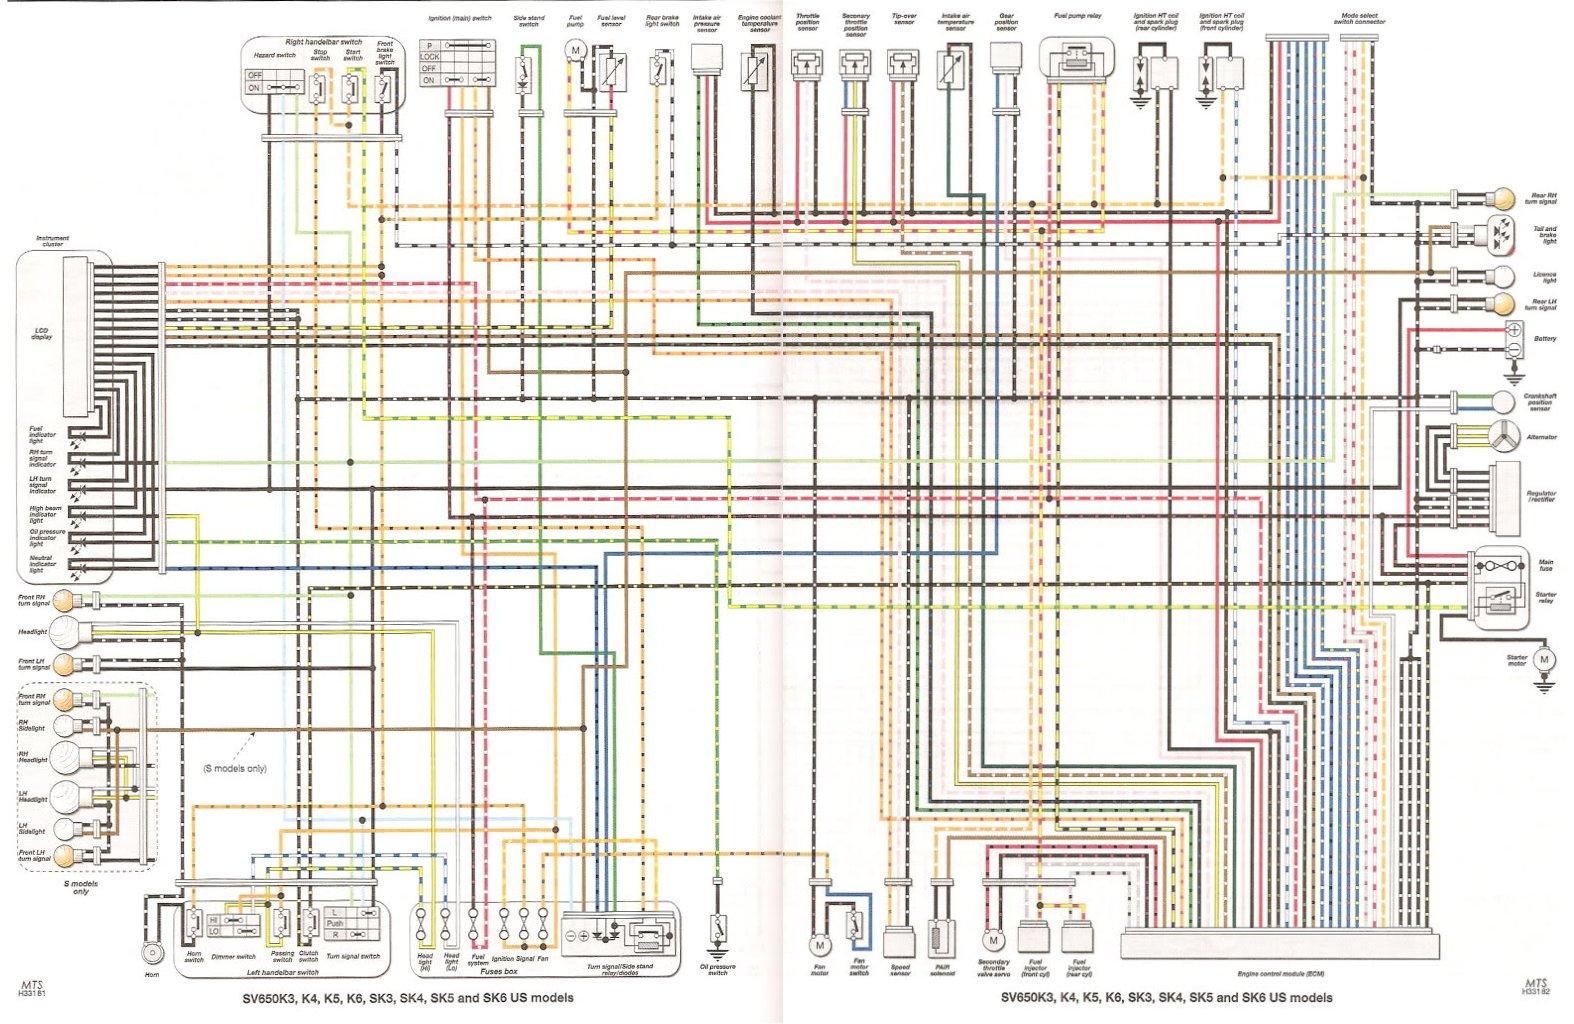 Sv 650 Wiring Diagram Page 3 And Schematics 1999 Sv650 K7 Data Diagrams U2022 Rh Mikeadkinsguitar Com 01